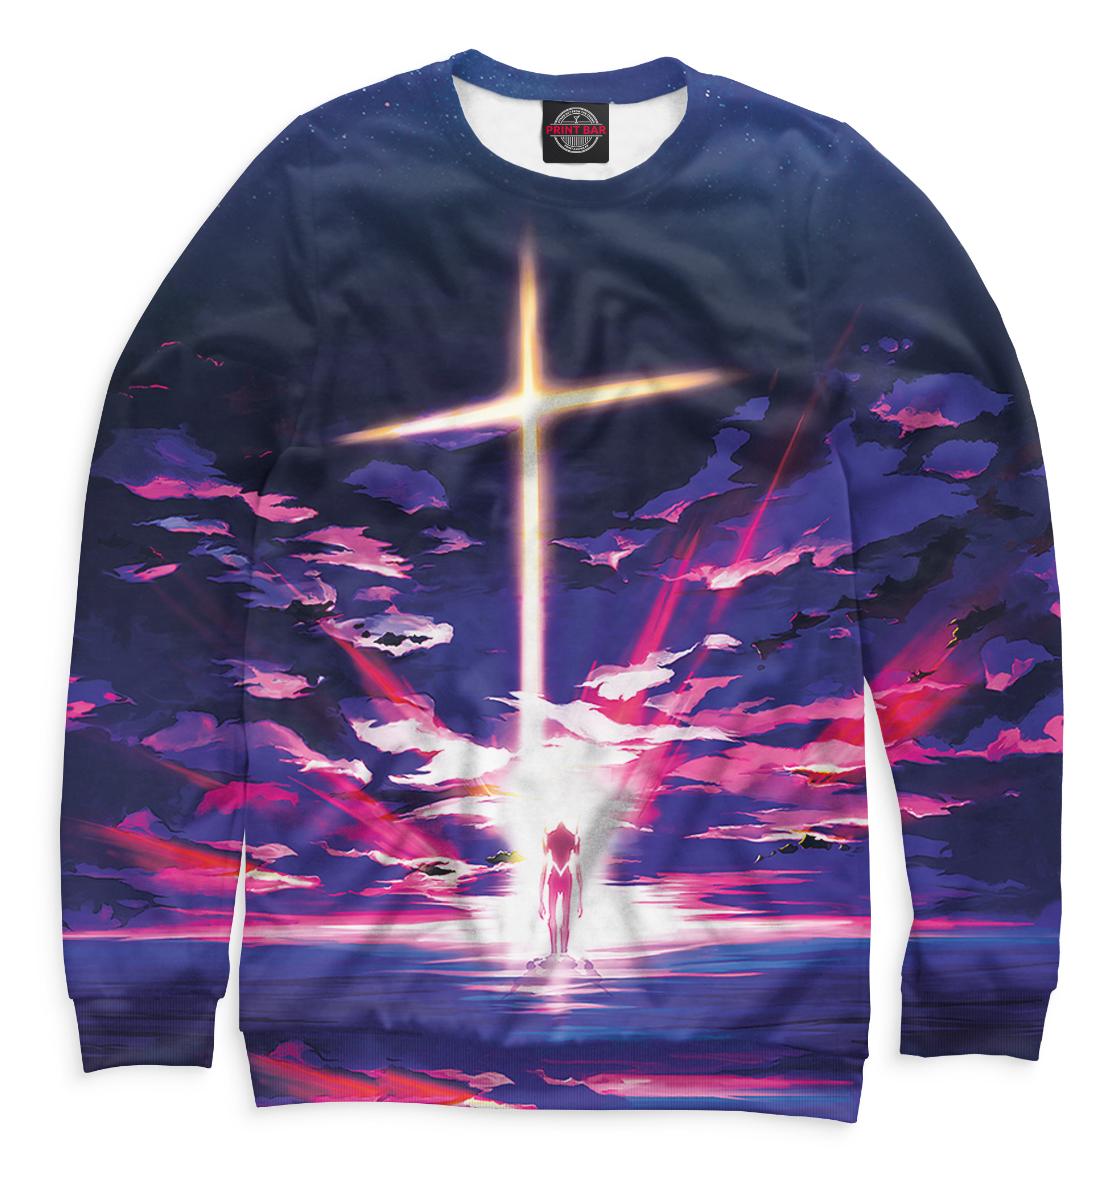 Купить Neon Genesis Evangelion, Printbar, Свитшоты, EVA-534396-swi-2